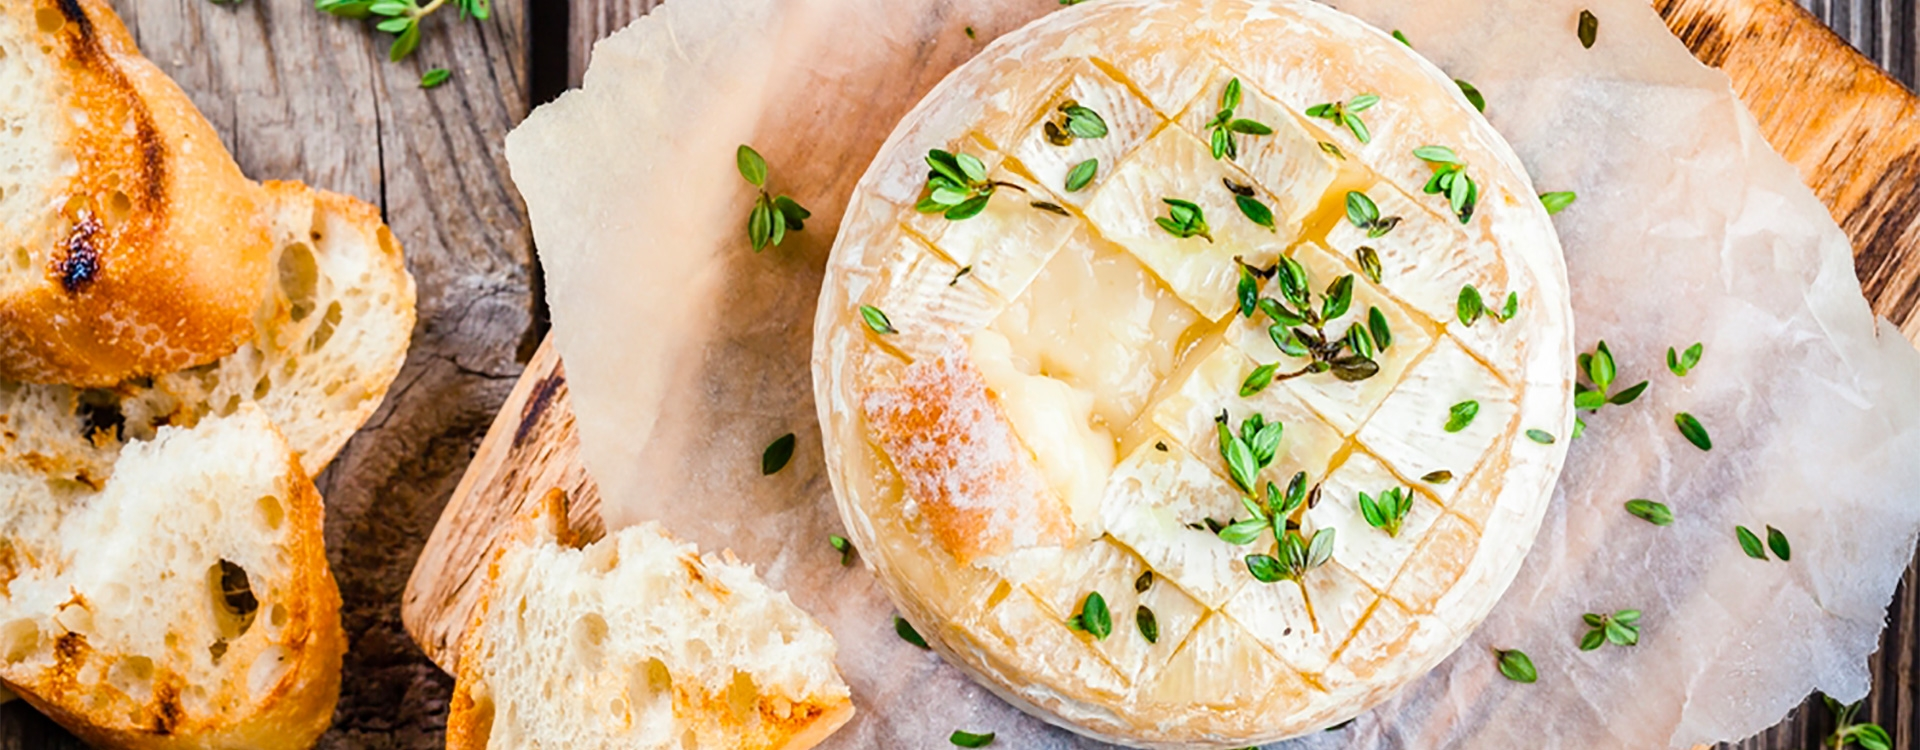 Camembert rôti au miel